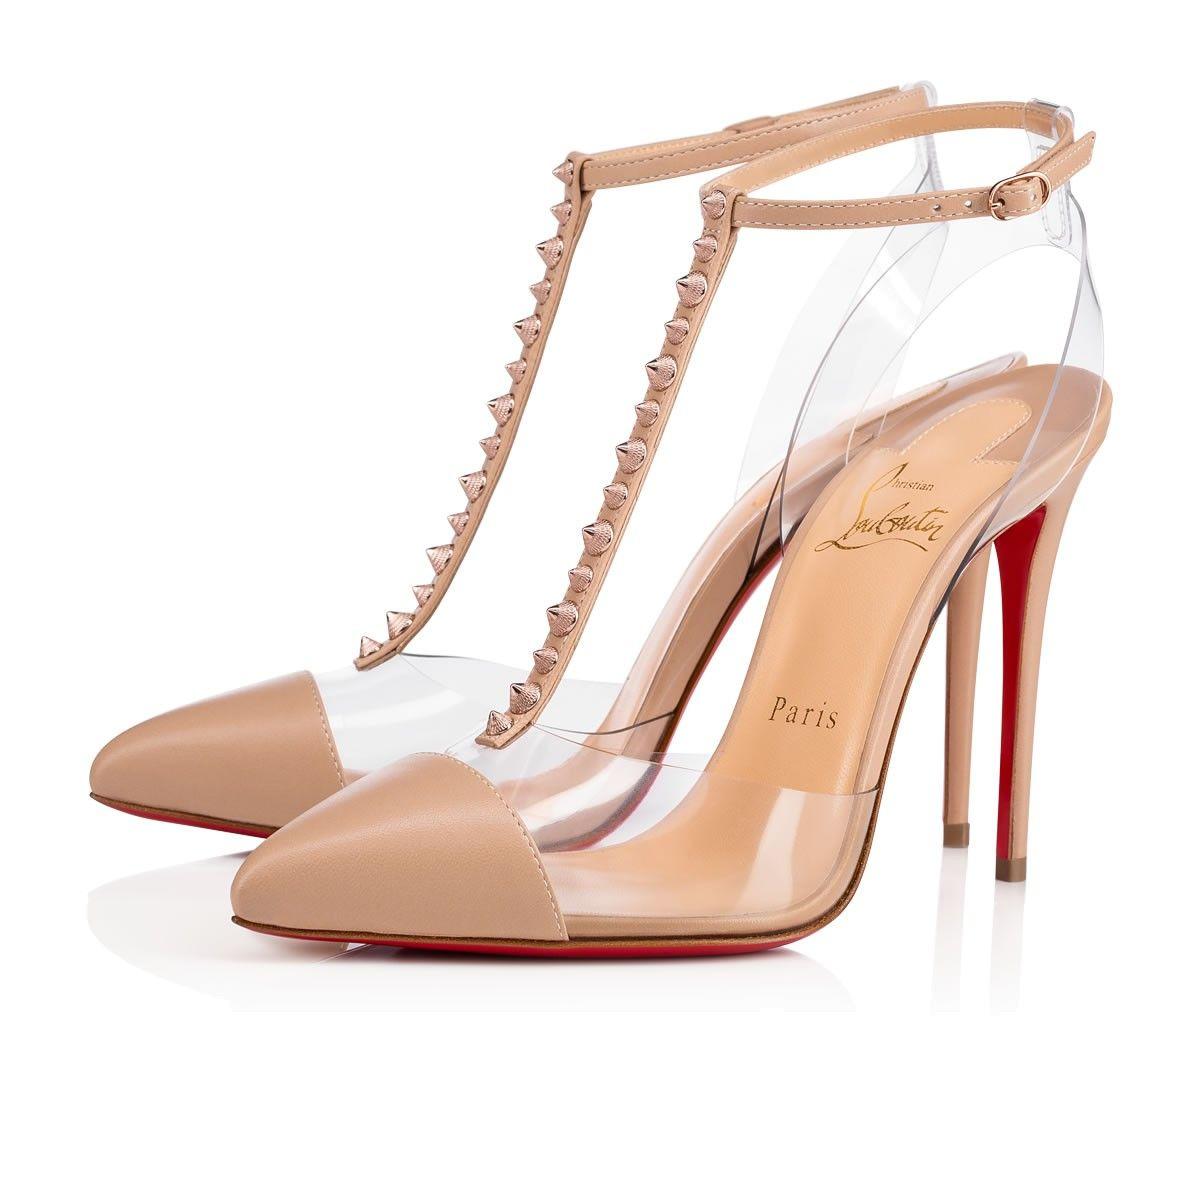 NOSY SPIKES NAPPA SHINY/PVC 100 Nu/Gold Rose Lambskin - Women Shoes - Christian  Louboutin